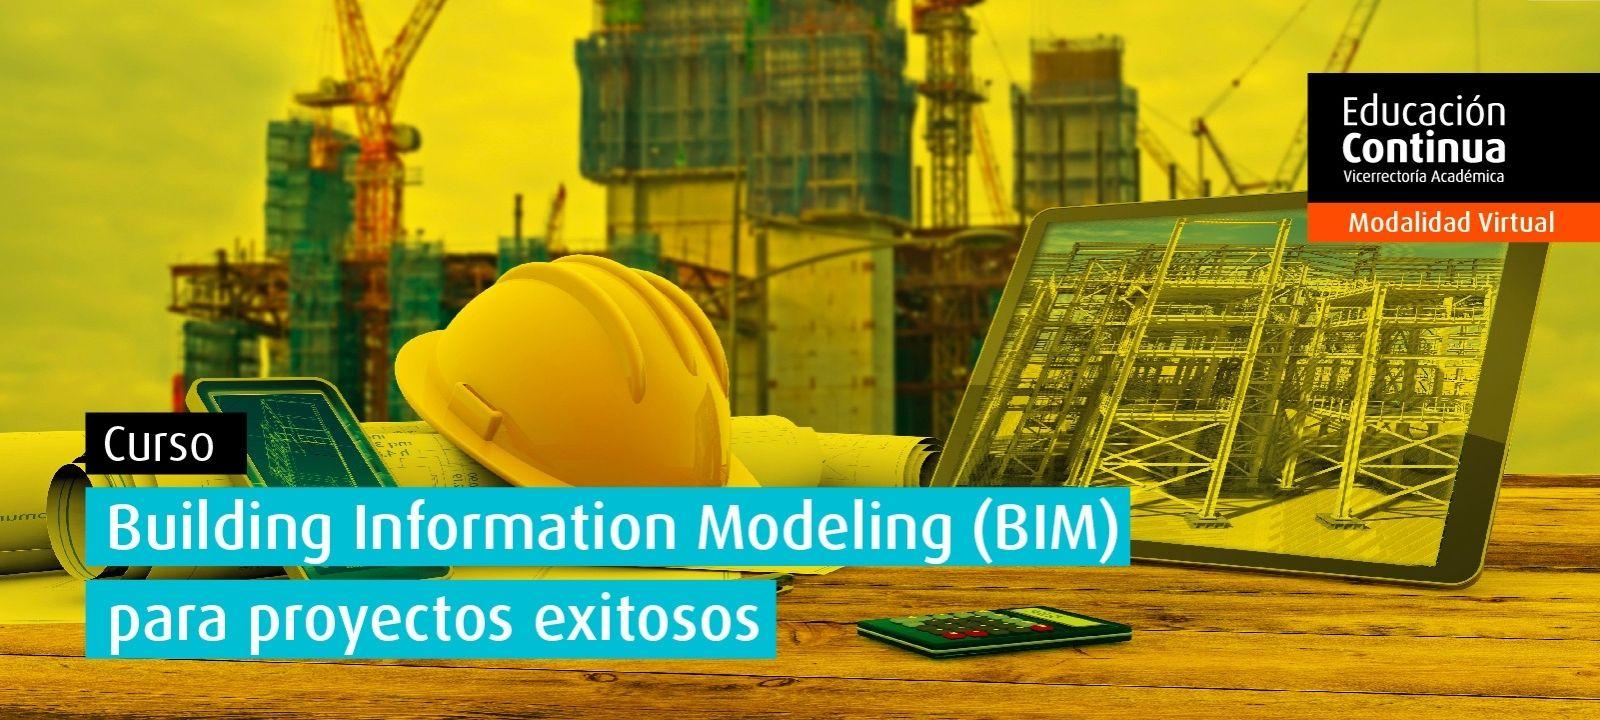 Curso virtual | Building Information Modeling (BIM) para proyectos exitosos